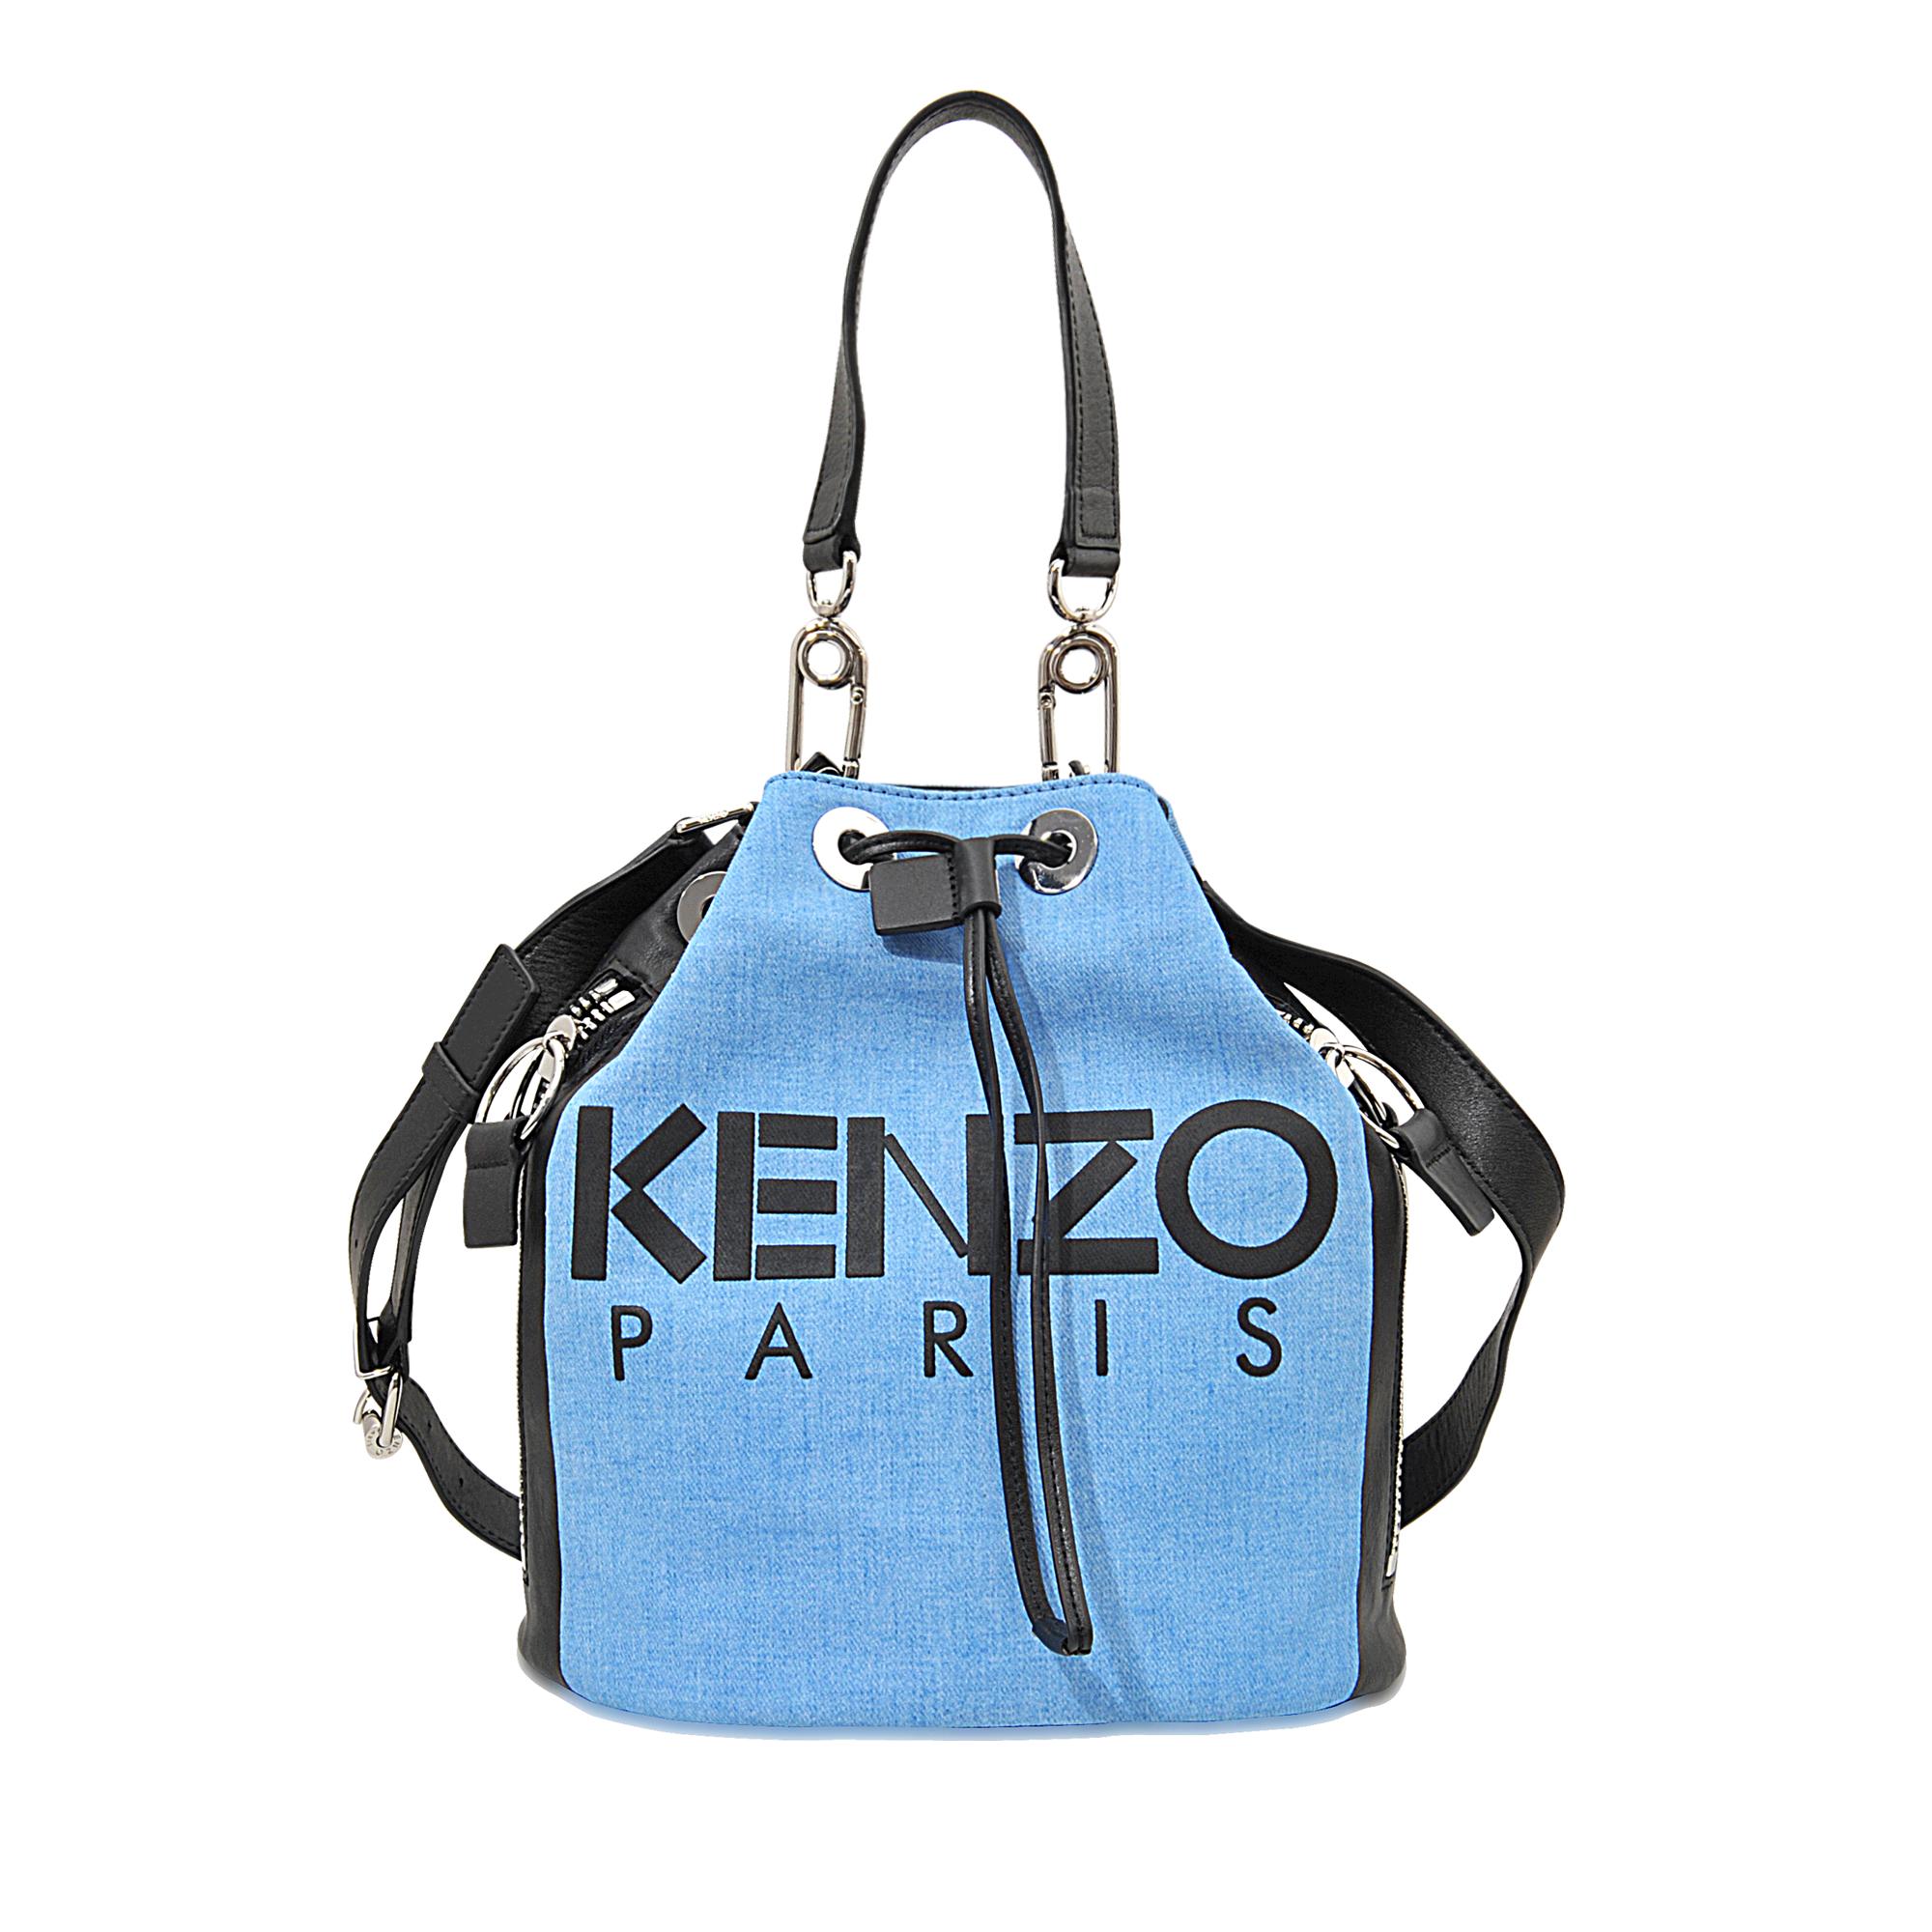 37705bbac3 KENZO Kanvas Bucket Bag in Blue - Lyst